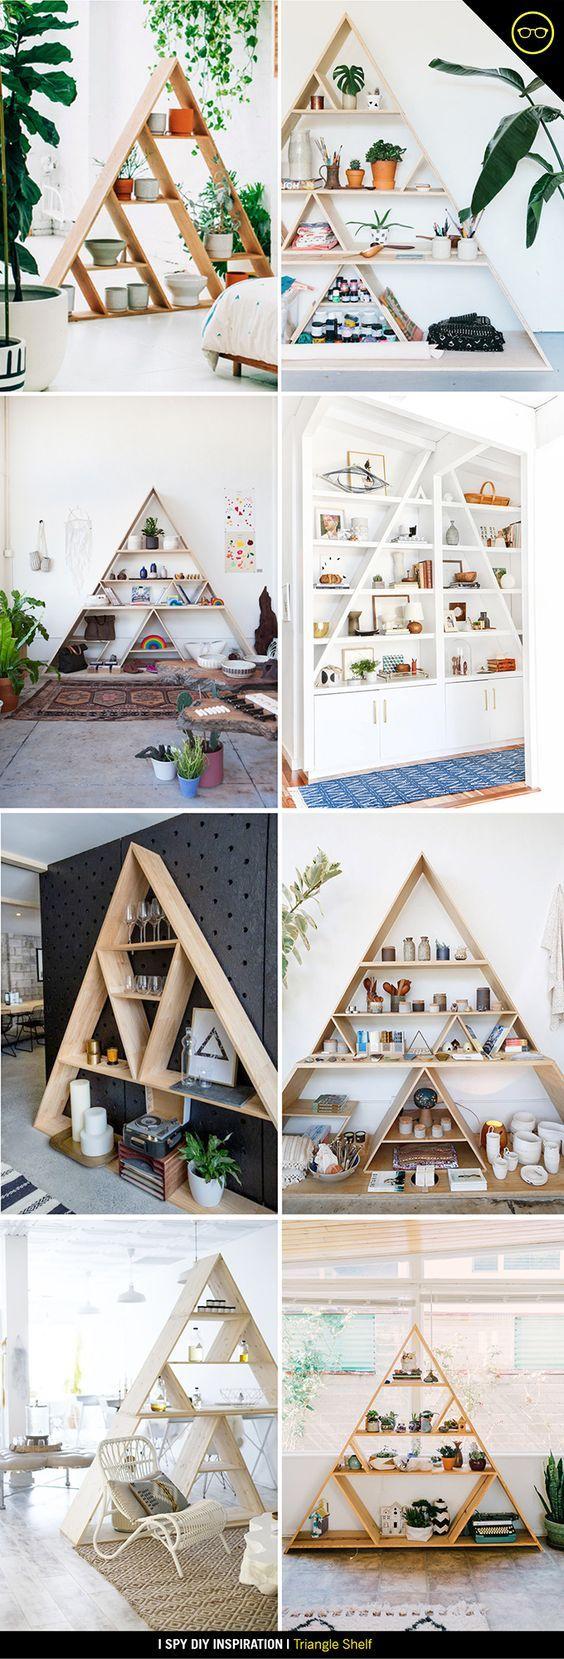 Best 25+ Triangle bookshelf ideas on Pinterest   How to decorate ...